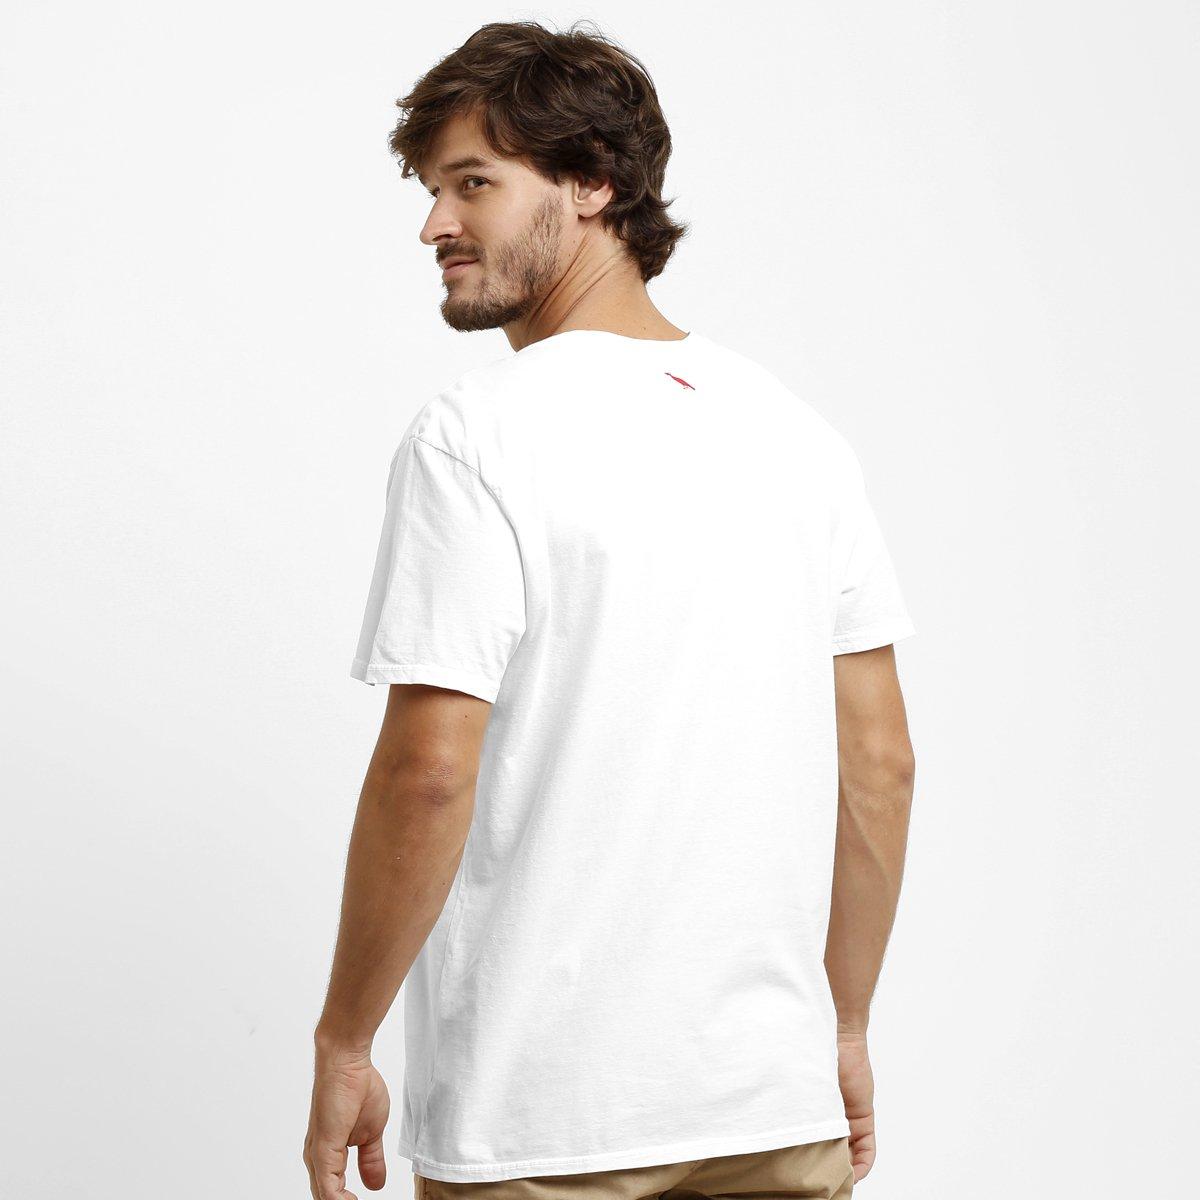 27900cc98c Camiseta Reserva Wally Skate  Camiseta Reserva Wally Skate ...